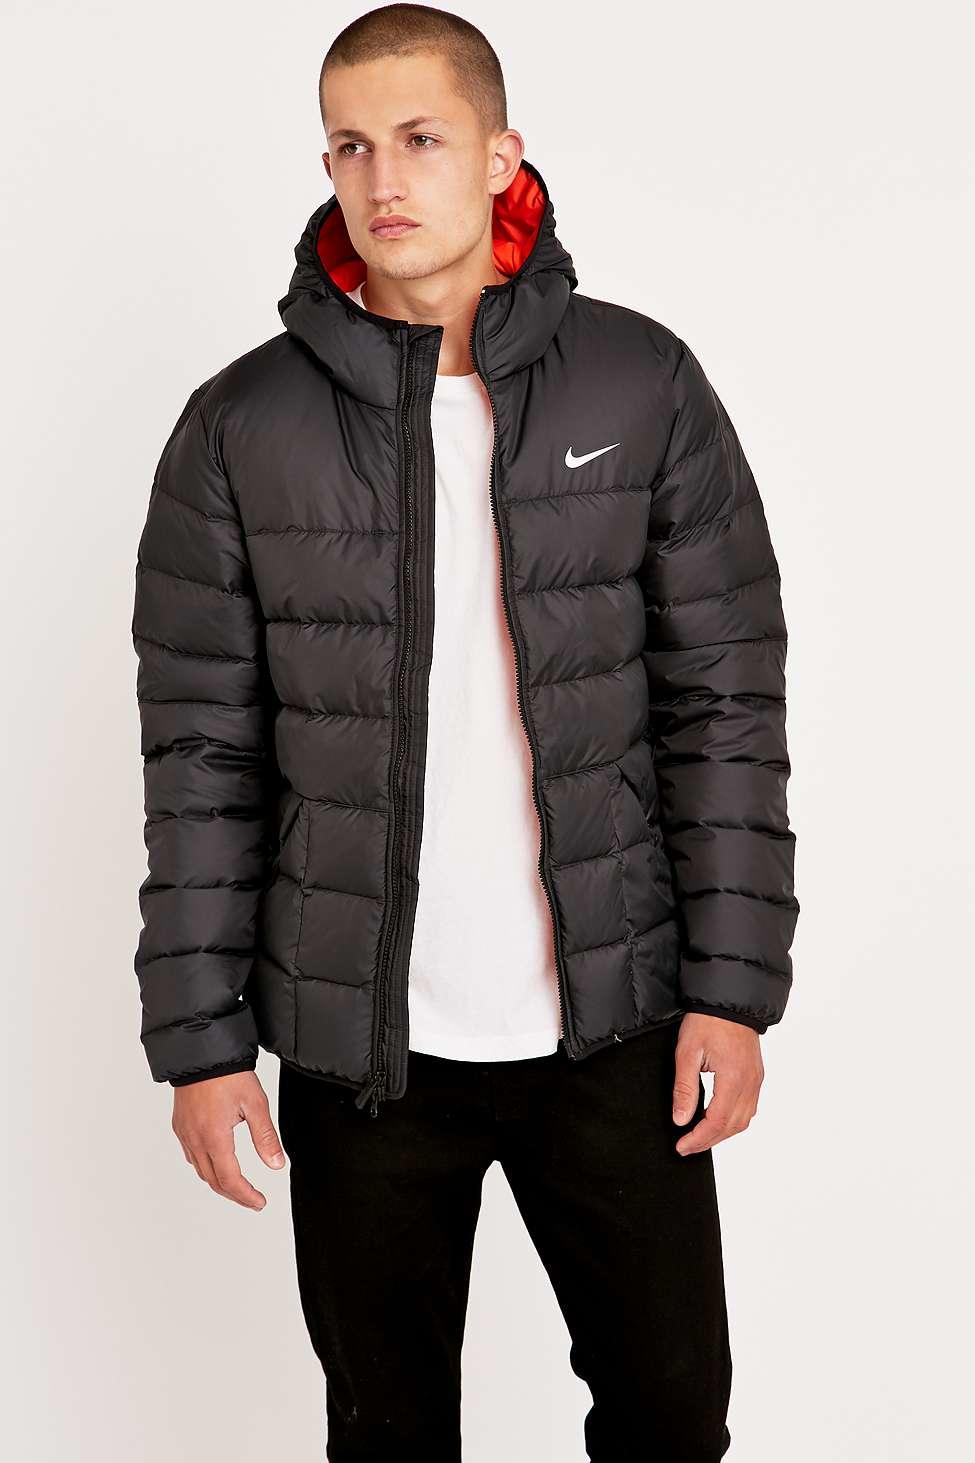 6ad756892150 Nike Alliance Black Jacket in Black for Men - Lyst